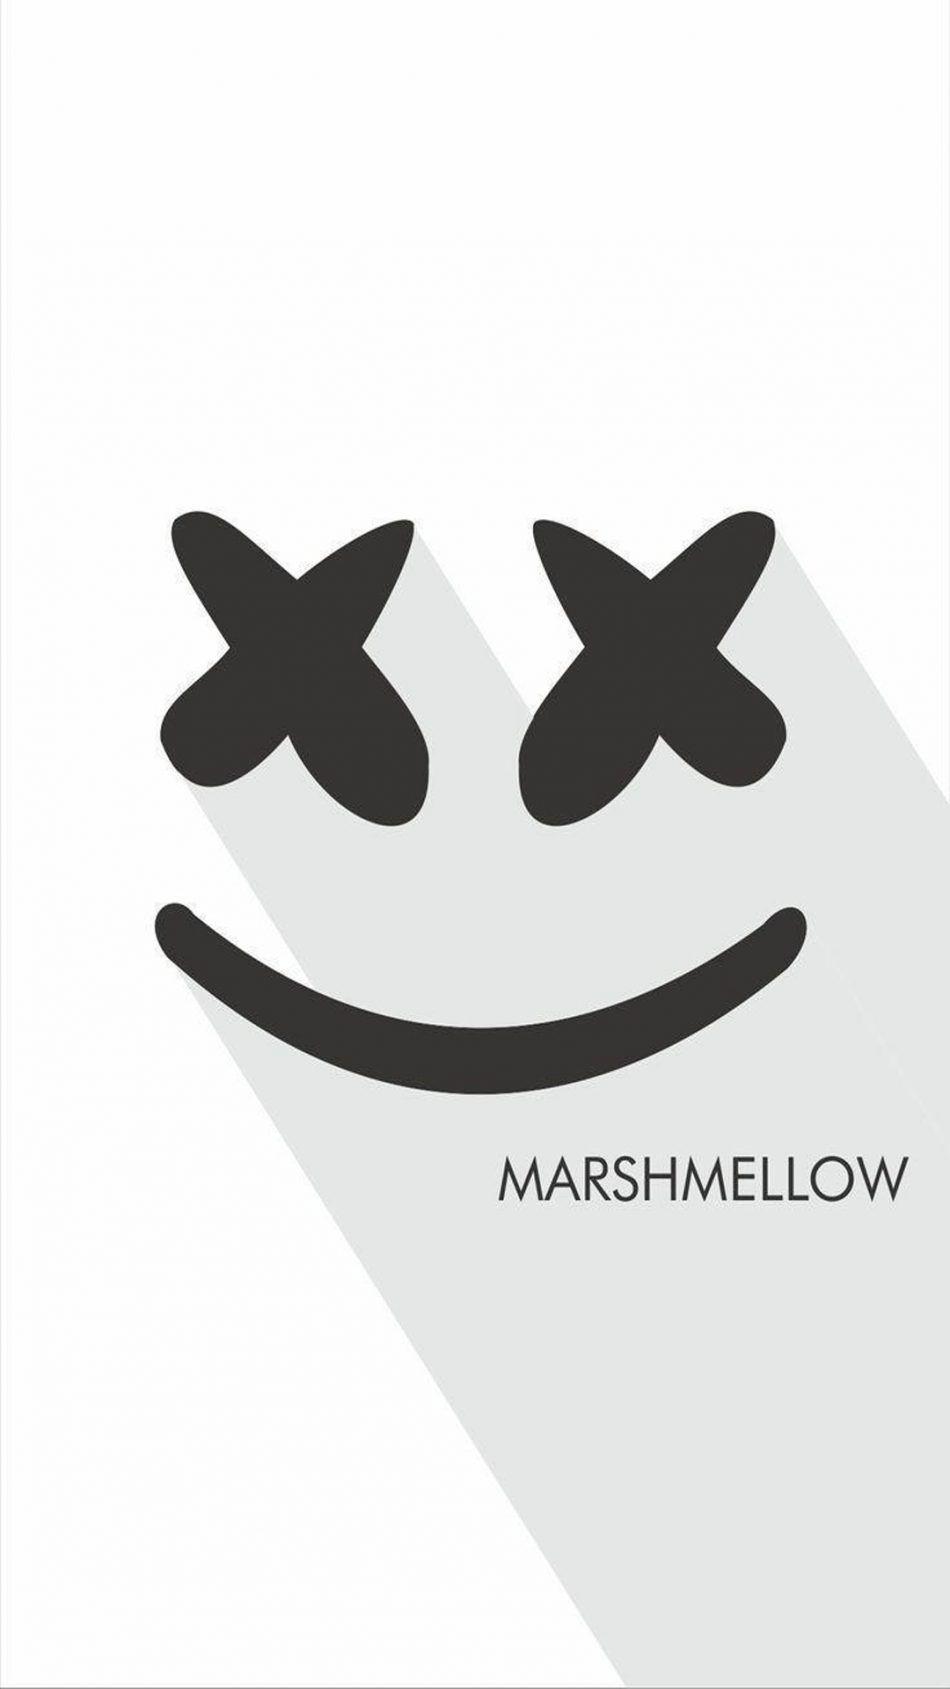 DJ Marshmello Logo Dj logo, Mobile wallpaper, Wallpaper